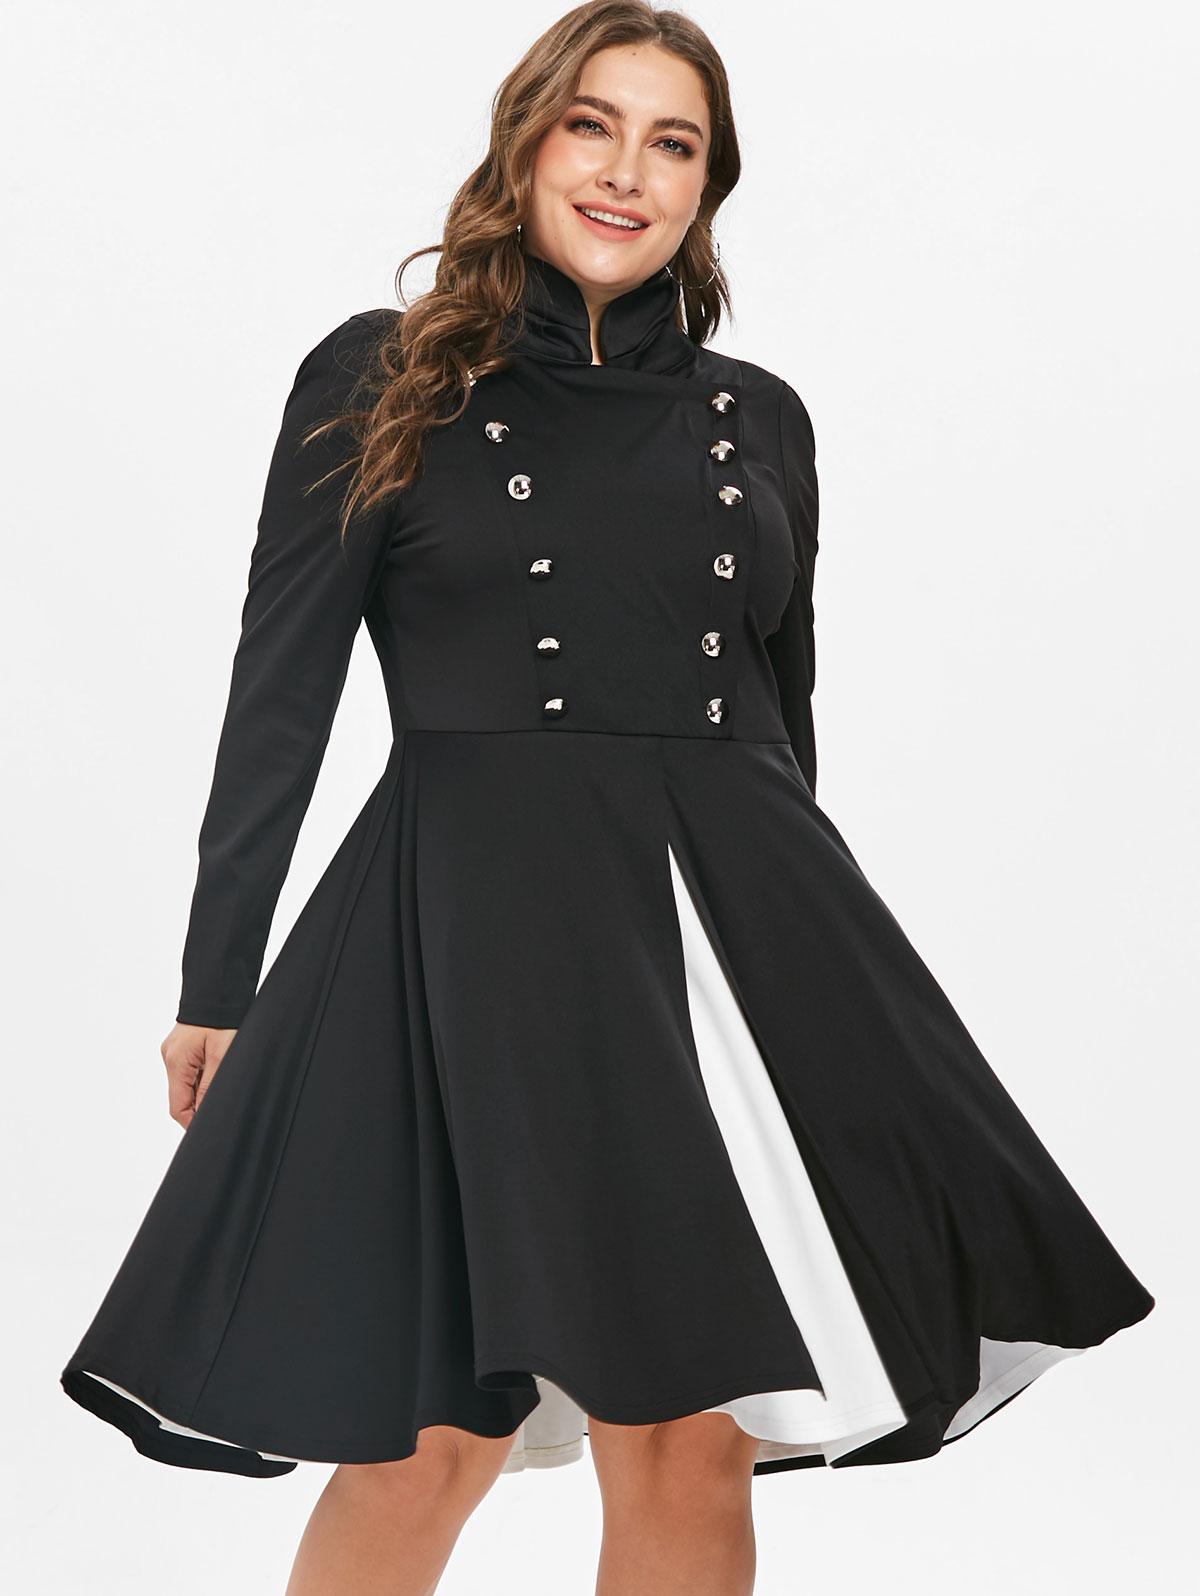 f81c17310e4 Cheap Black Tight Dresses Off Shoulder Best Black Evening Tops Plus Size